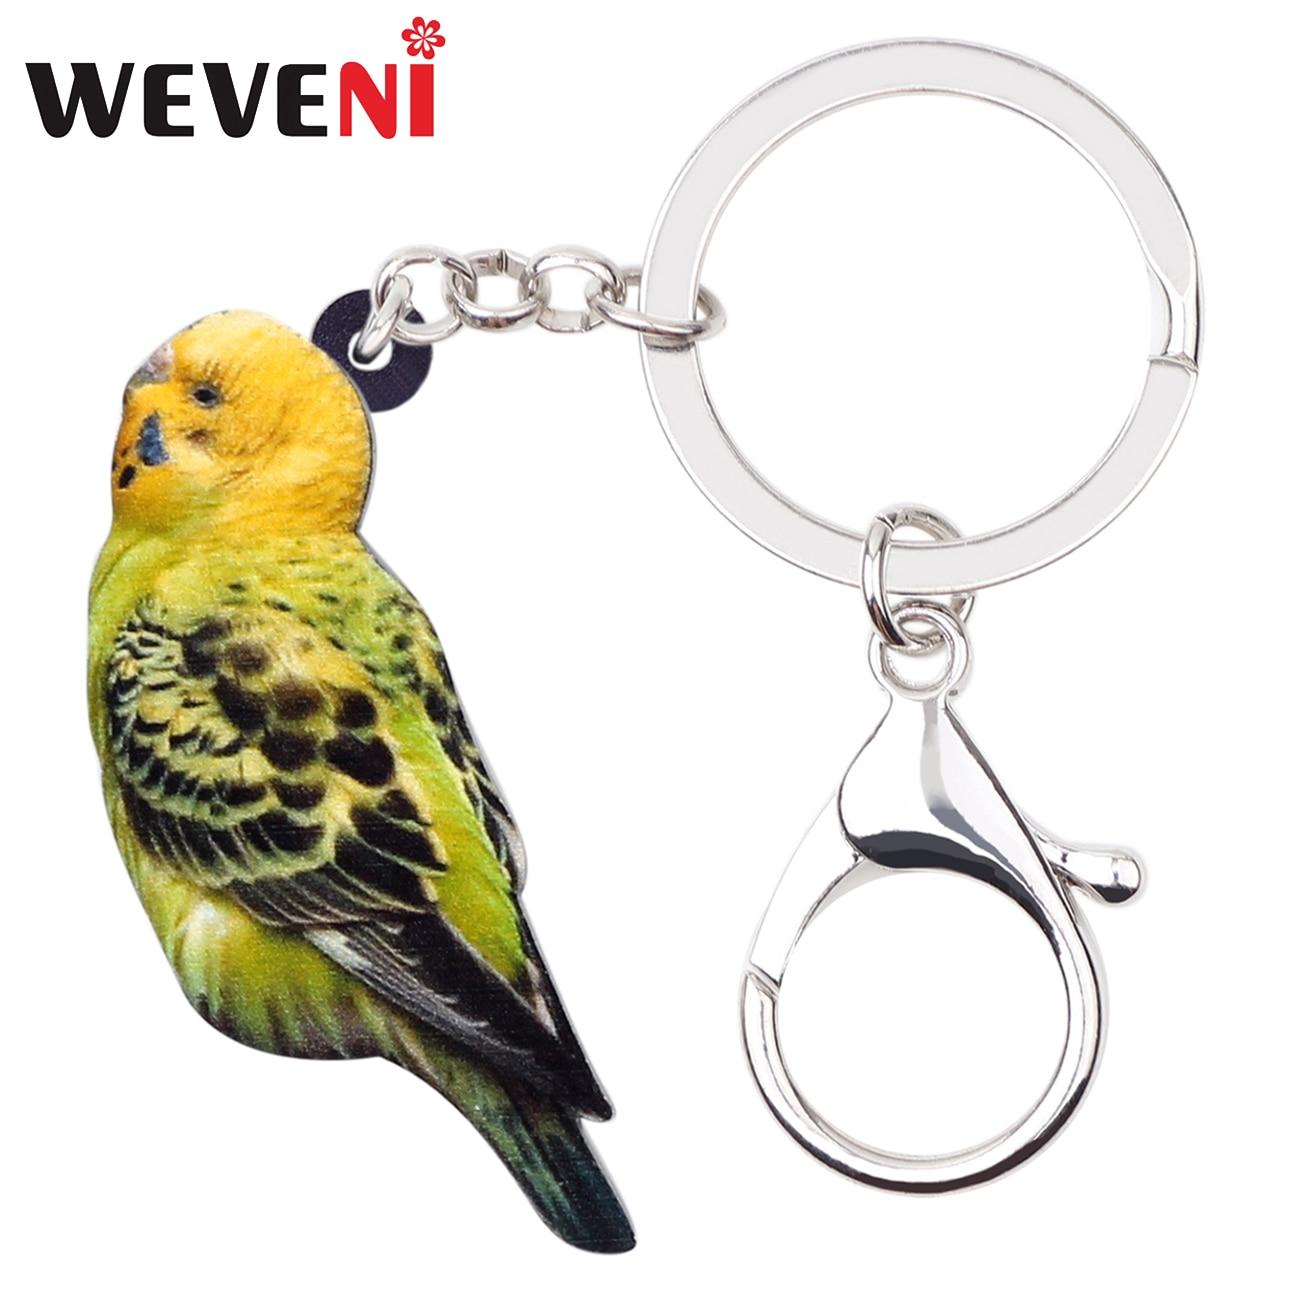 WEVENI Acrylic Budgerigar Parrot Bird Key Chain Keychain Ring Tropic Animal Jewelry For Women Girls Bag Car Purse Charms Pendant